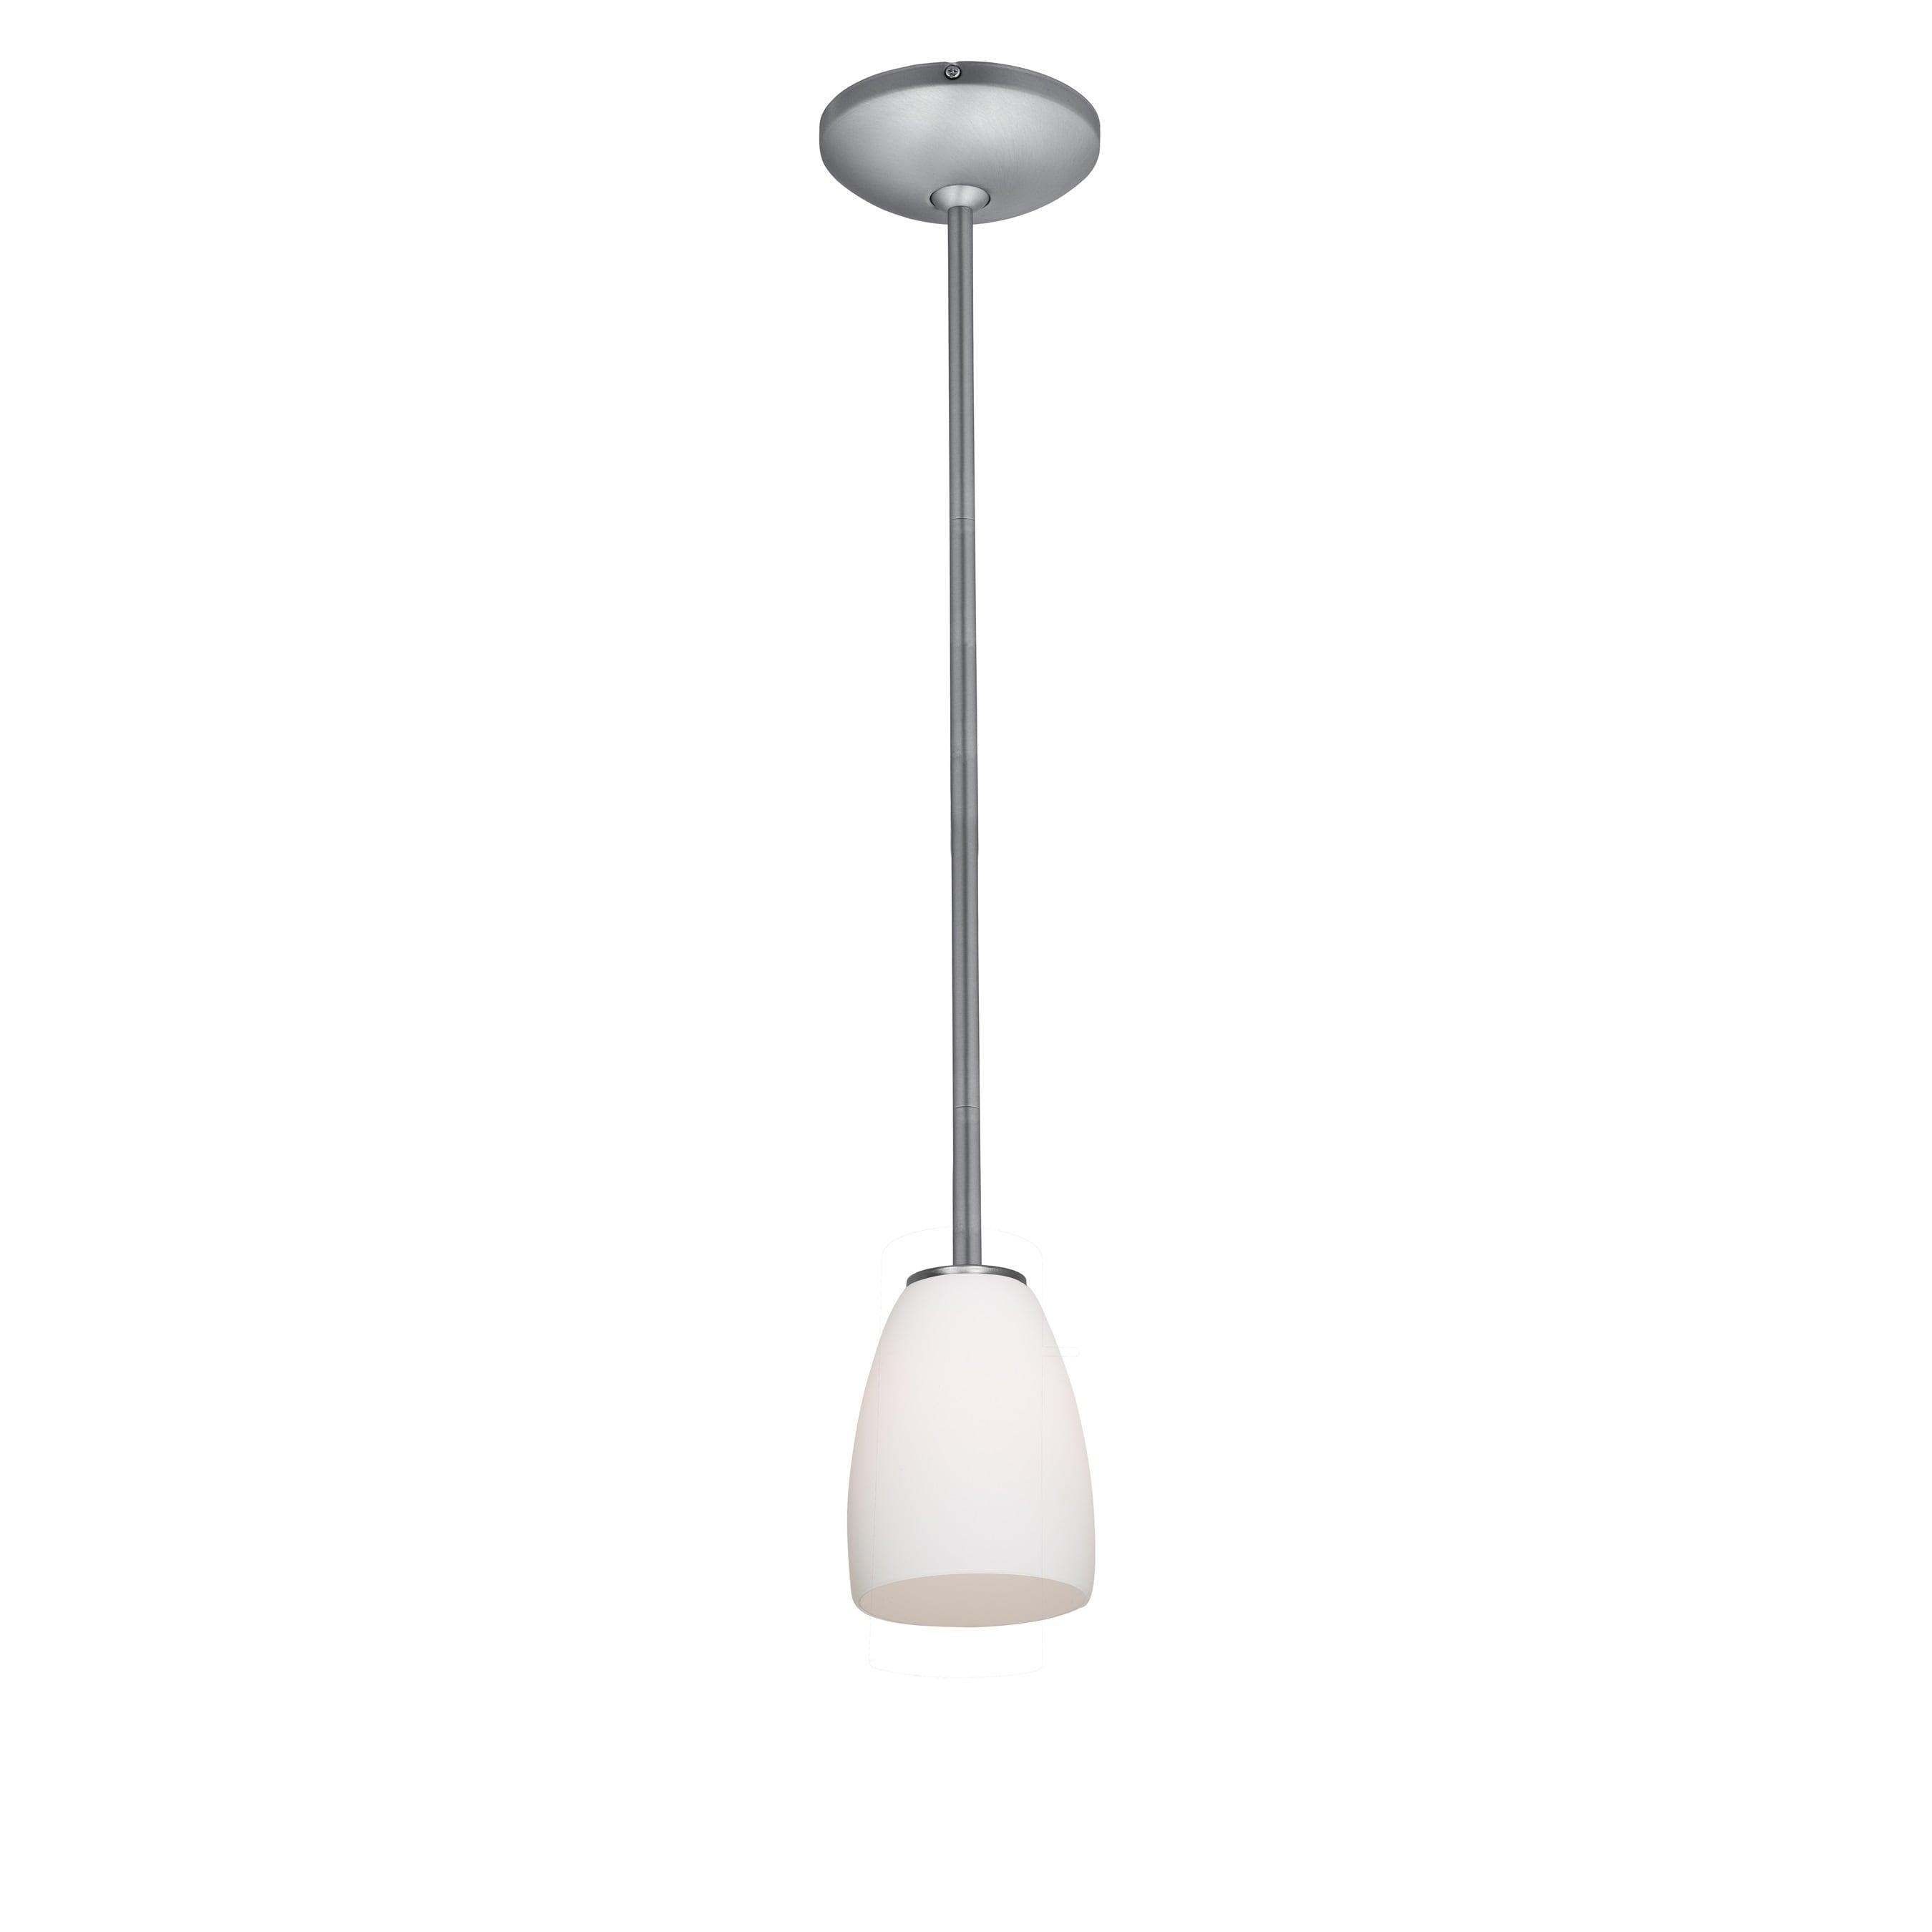 Access Lighting Japanese Lantern 12 inch Steel Fluorescen...